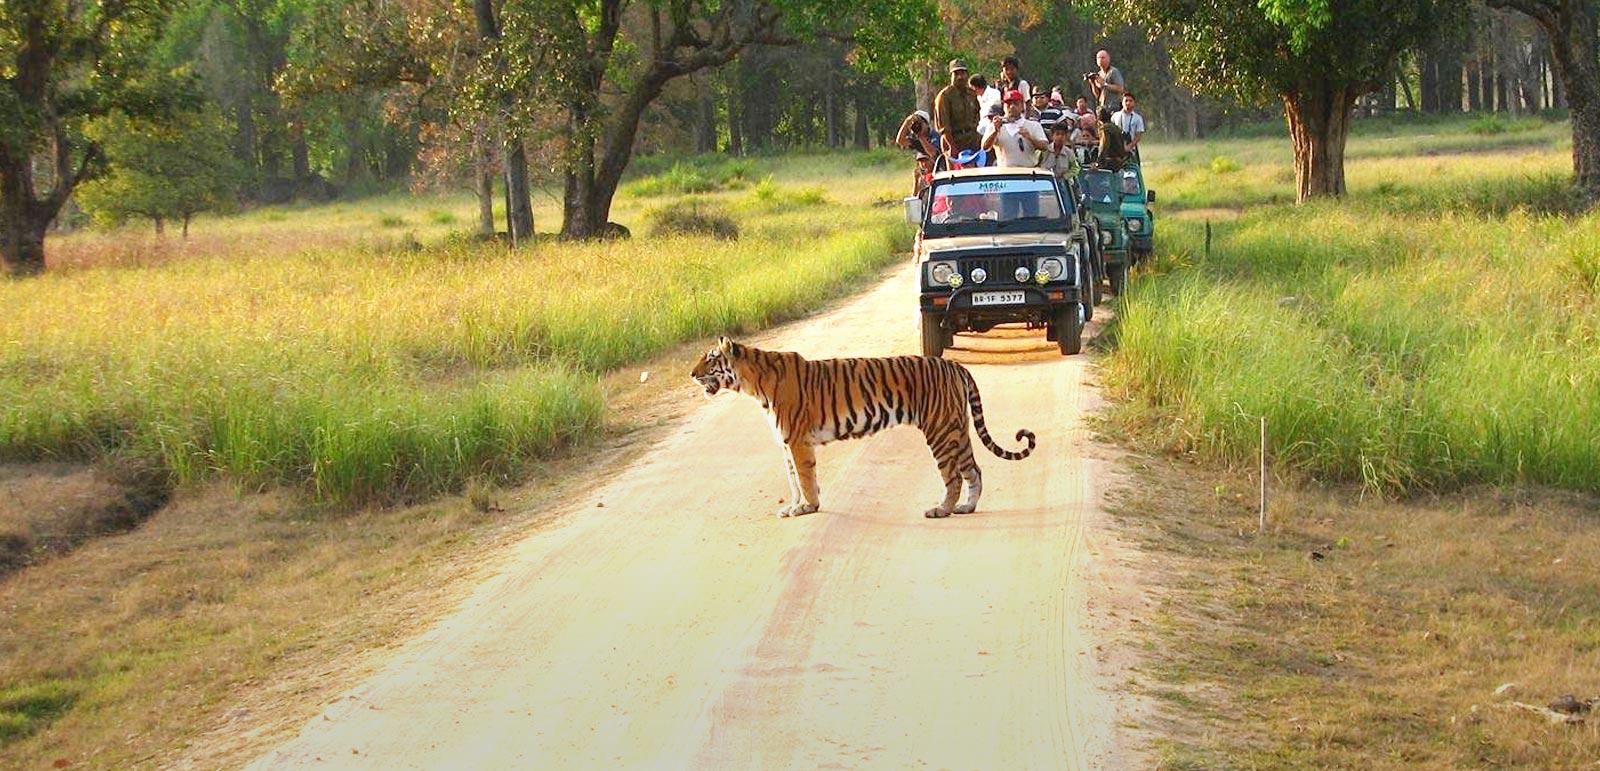 Jeep Safari in Tadoba National Park